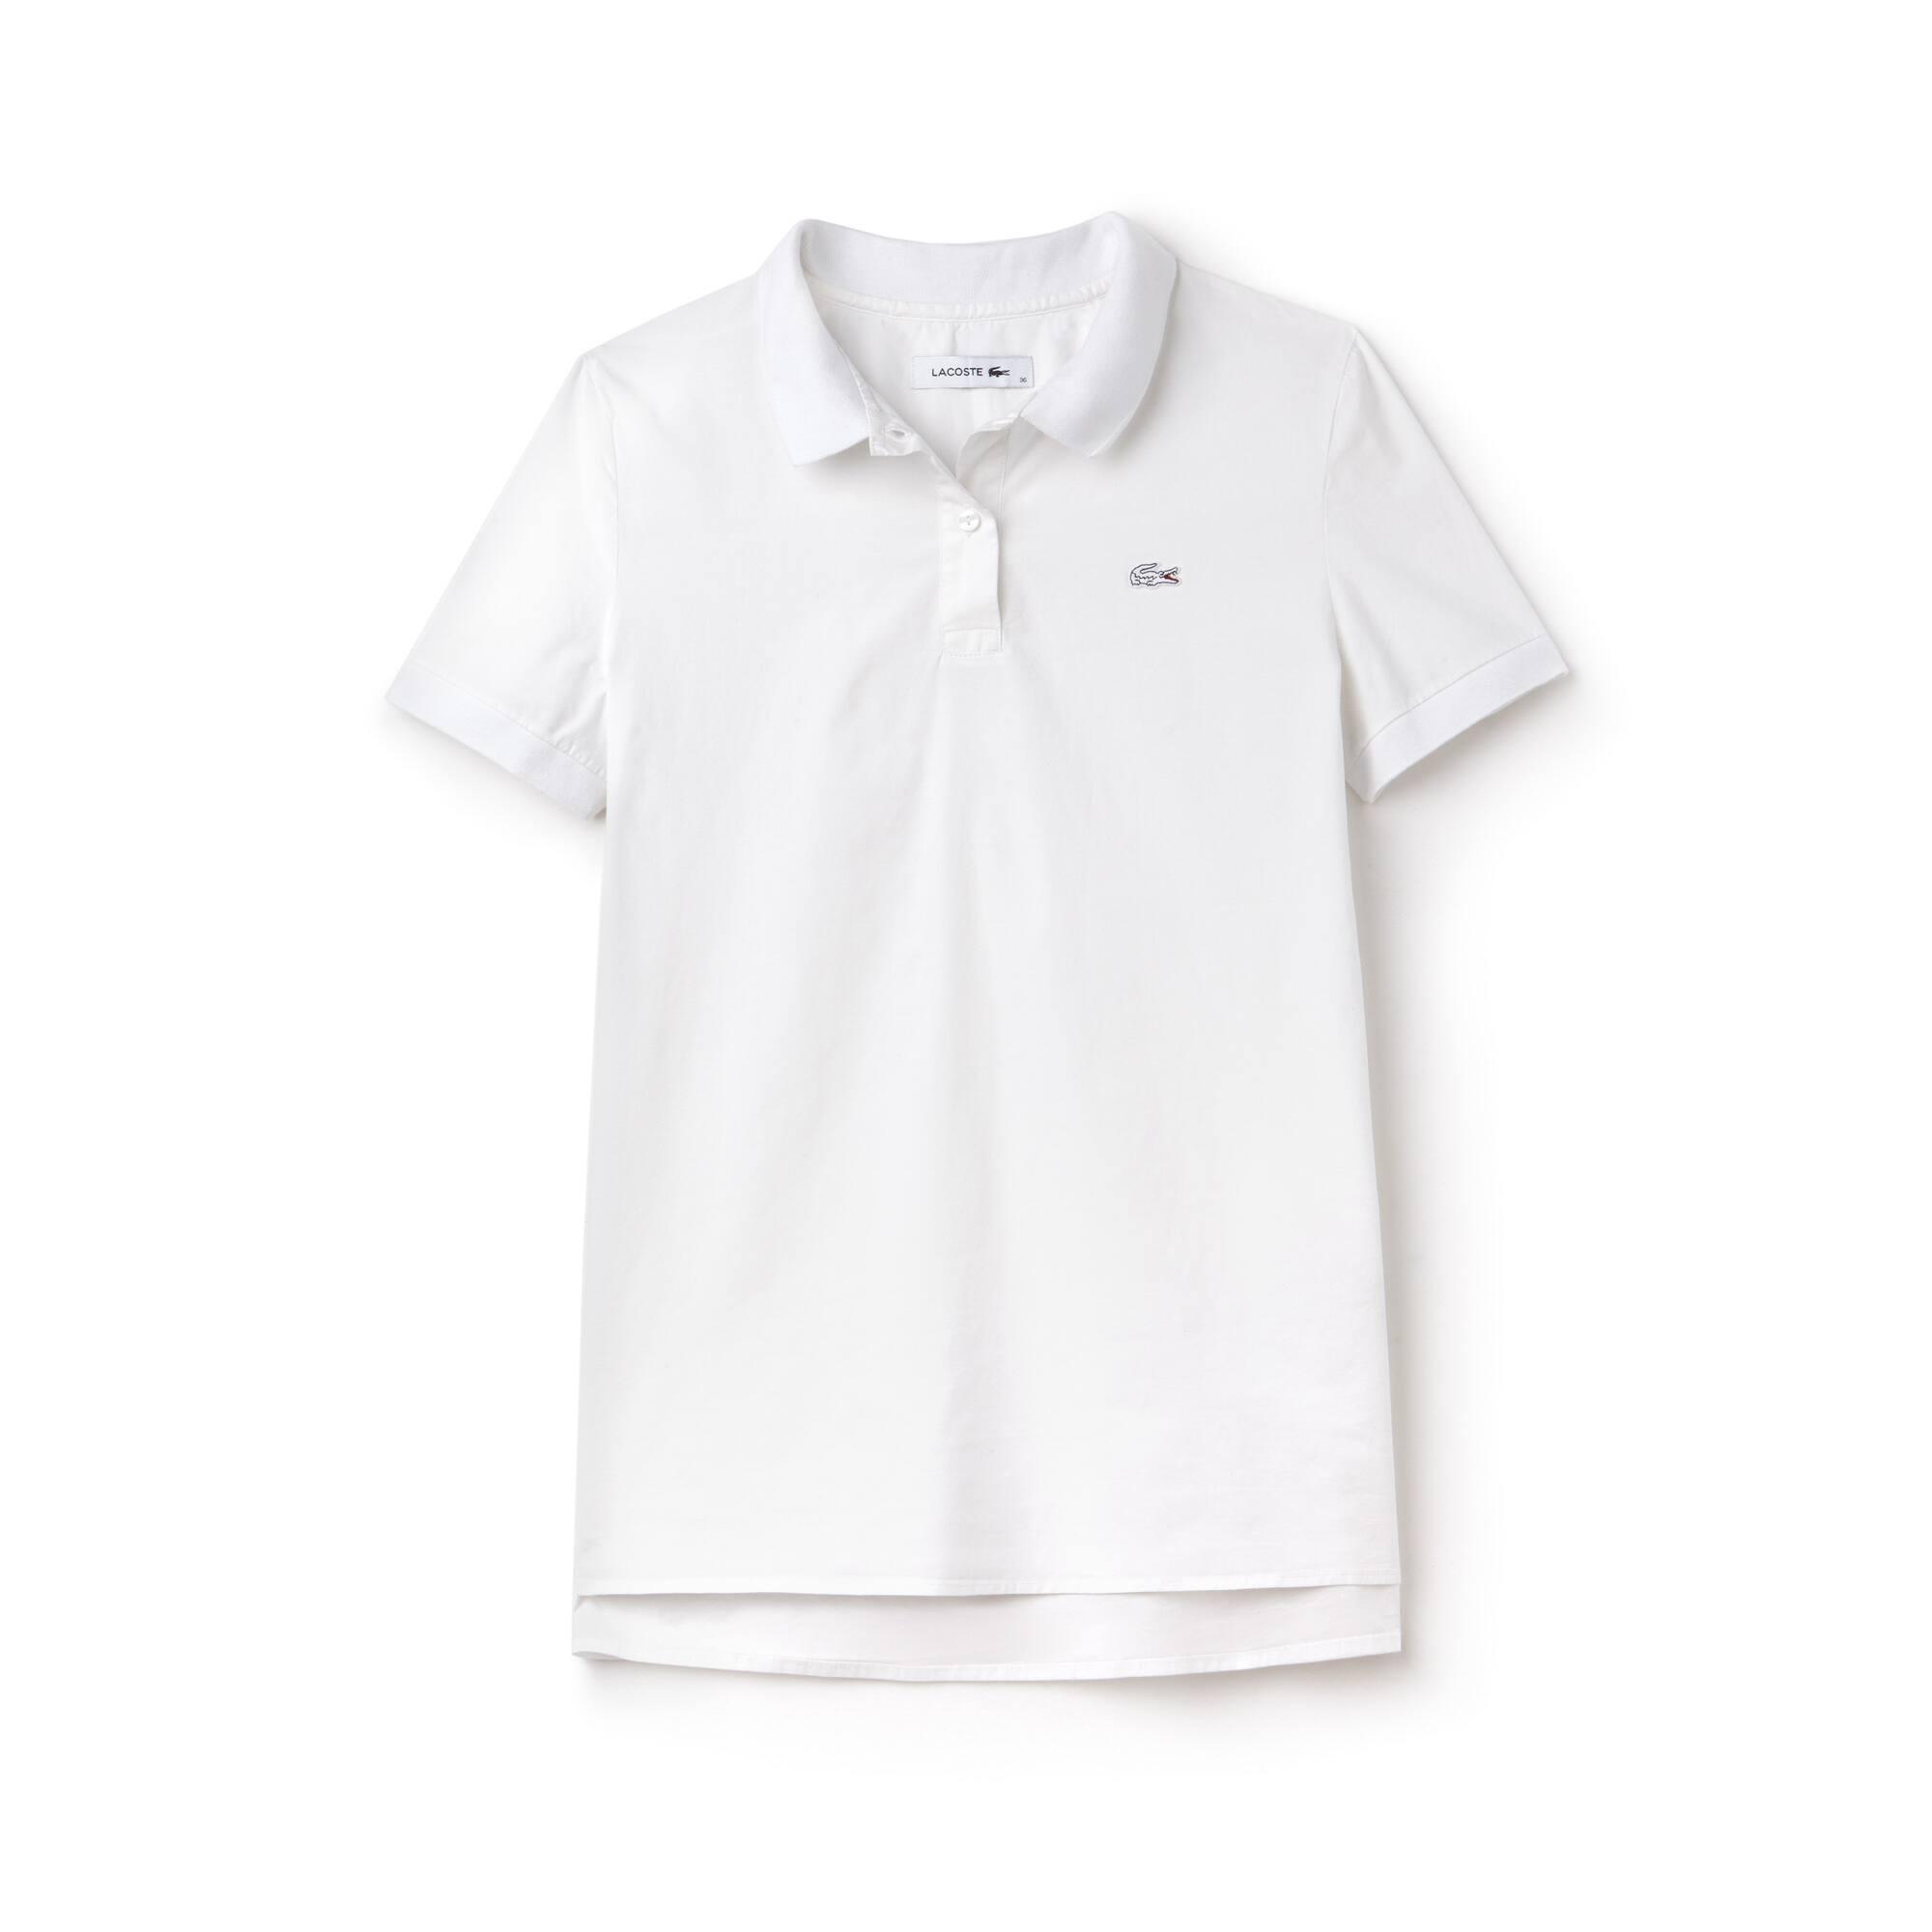 Camisa Lacoste Regular Fit Feminina em Popeline Stretch